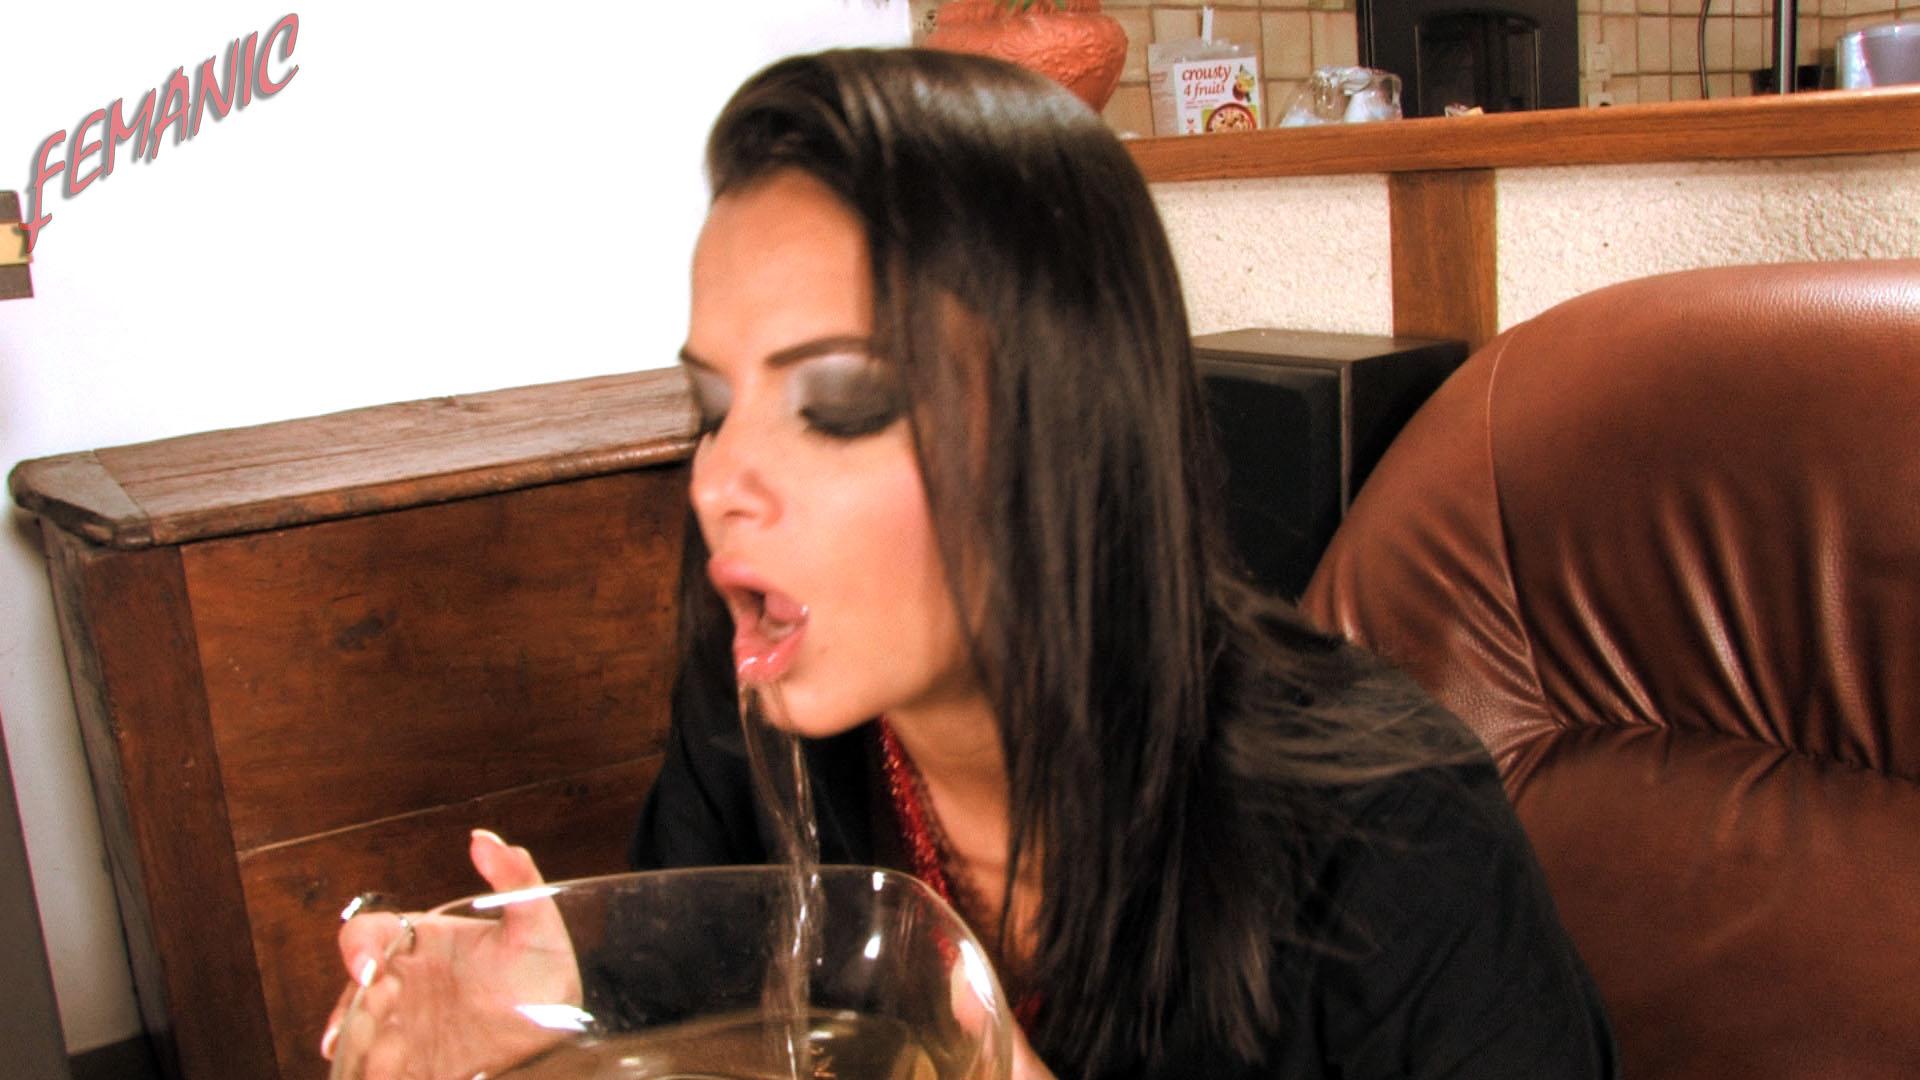 Sasha kiss peeing